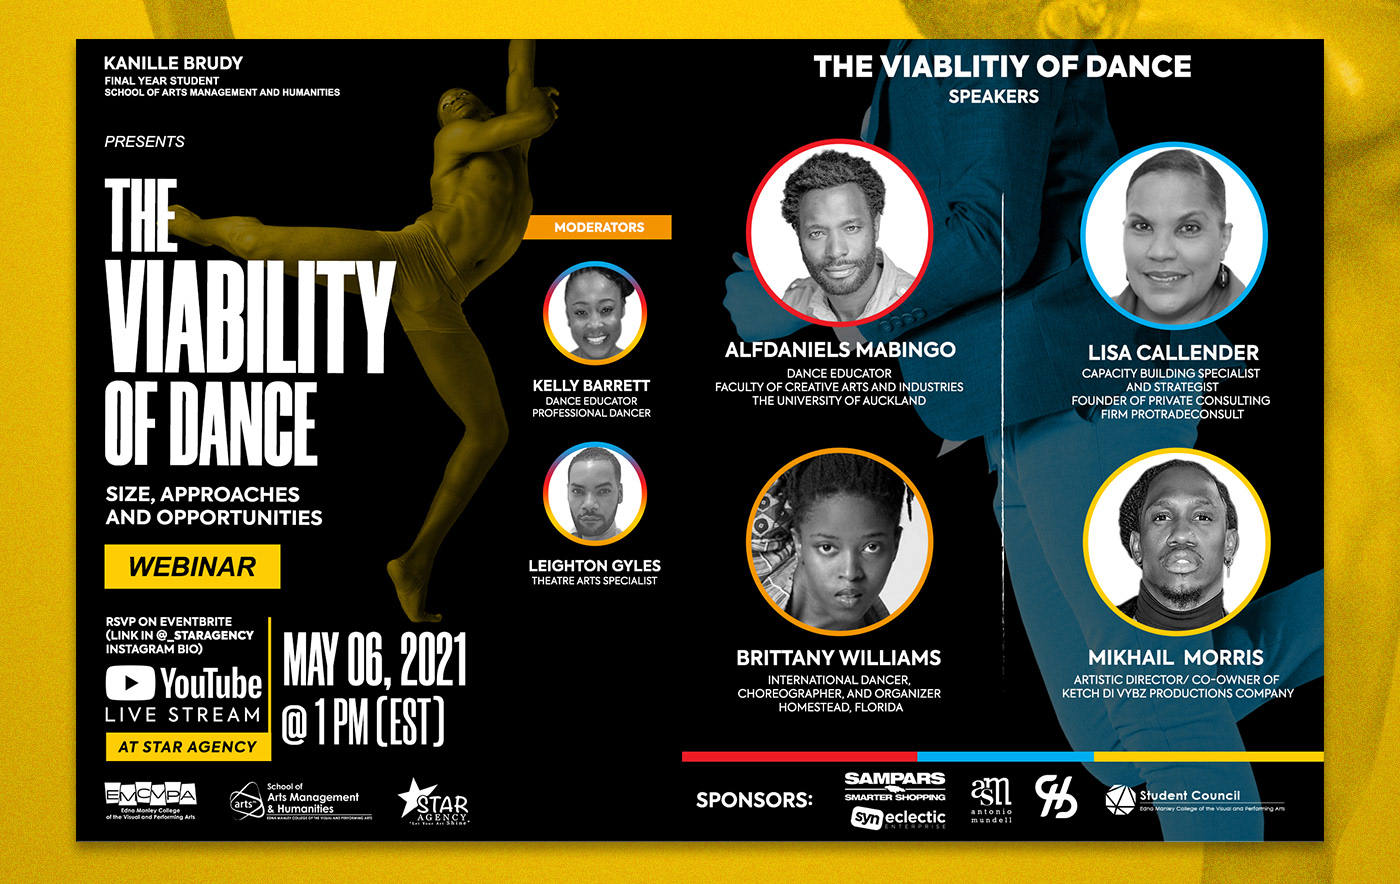 The Viability of Dance webinar artwork by Kenneil Smith